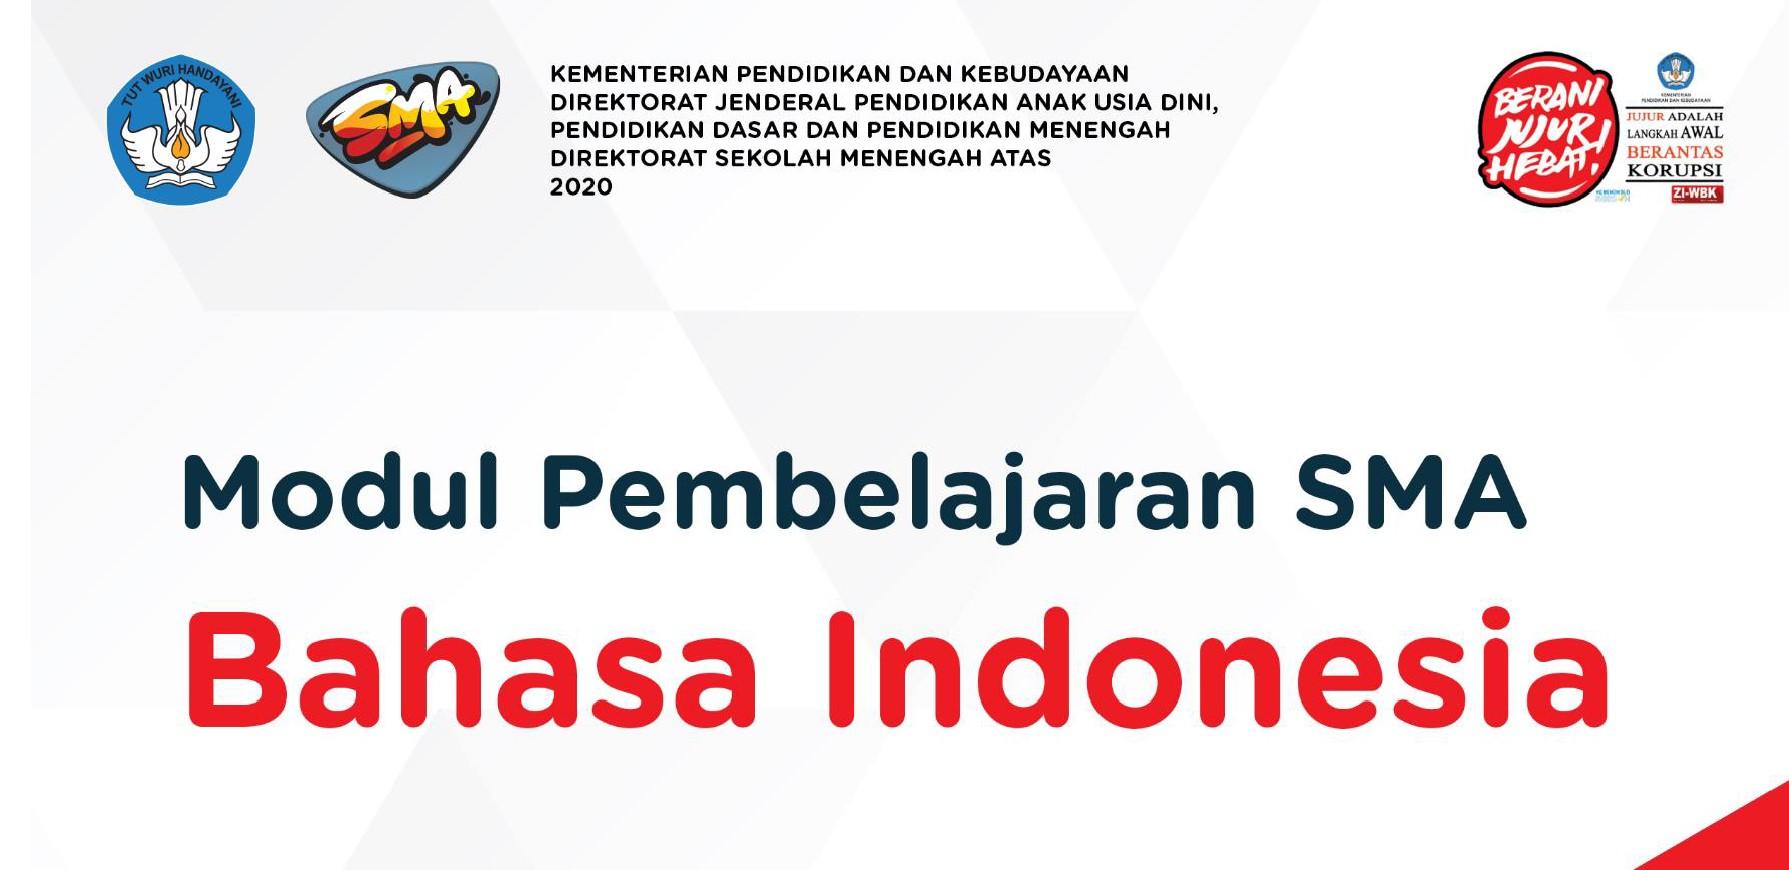 Modul Pembelajaran Bahasa Indonesia Untuk SMA Kelas X, XI dan XII